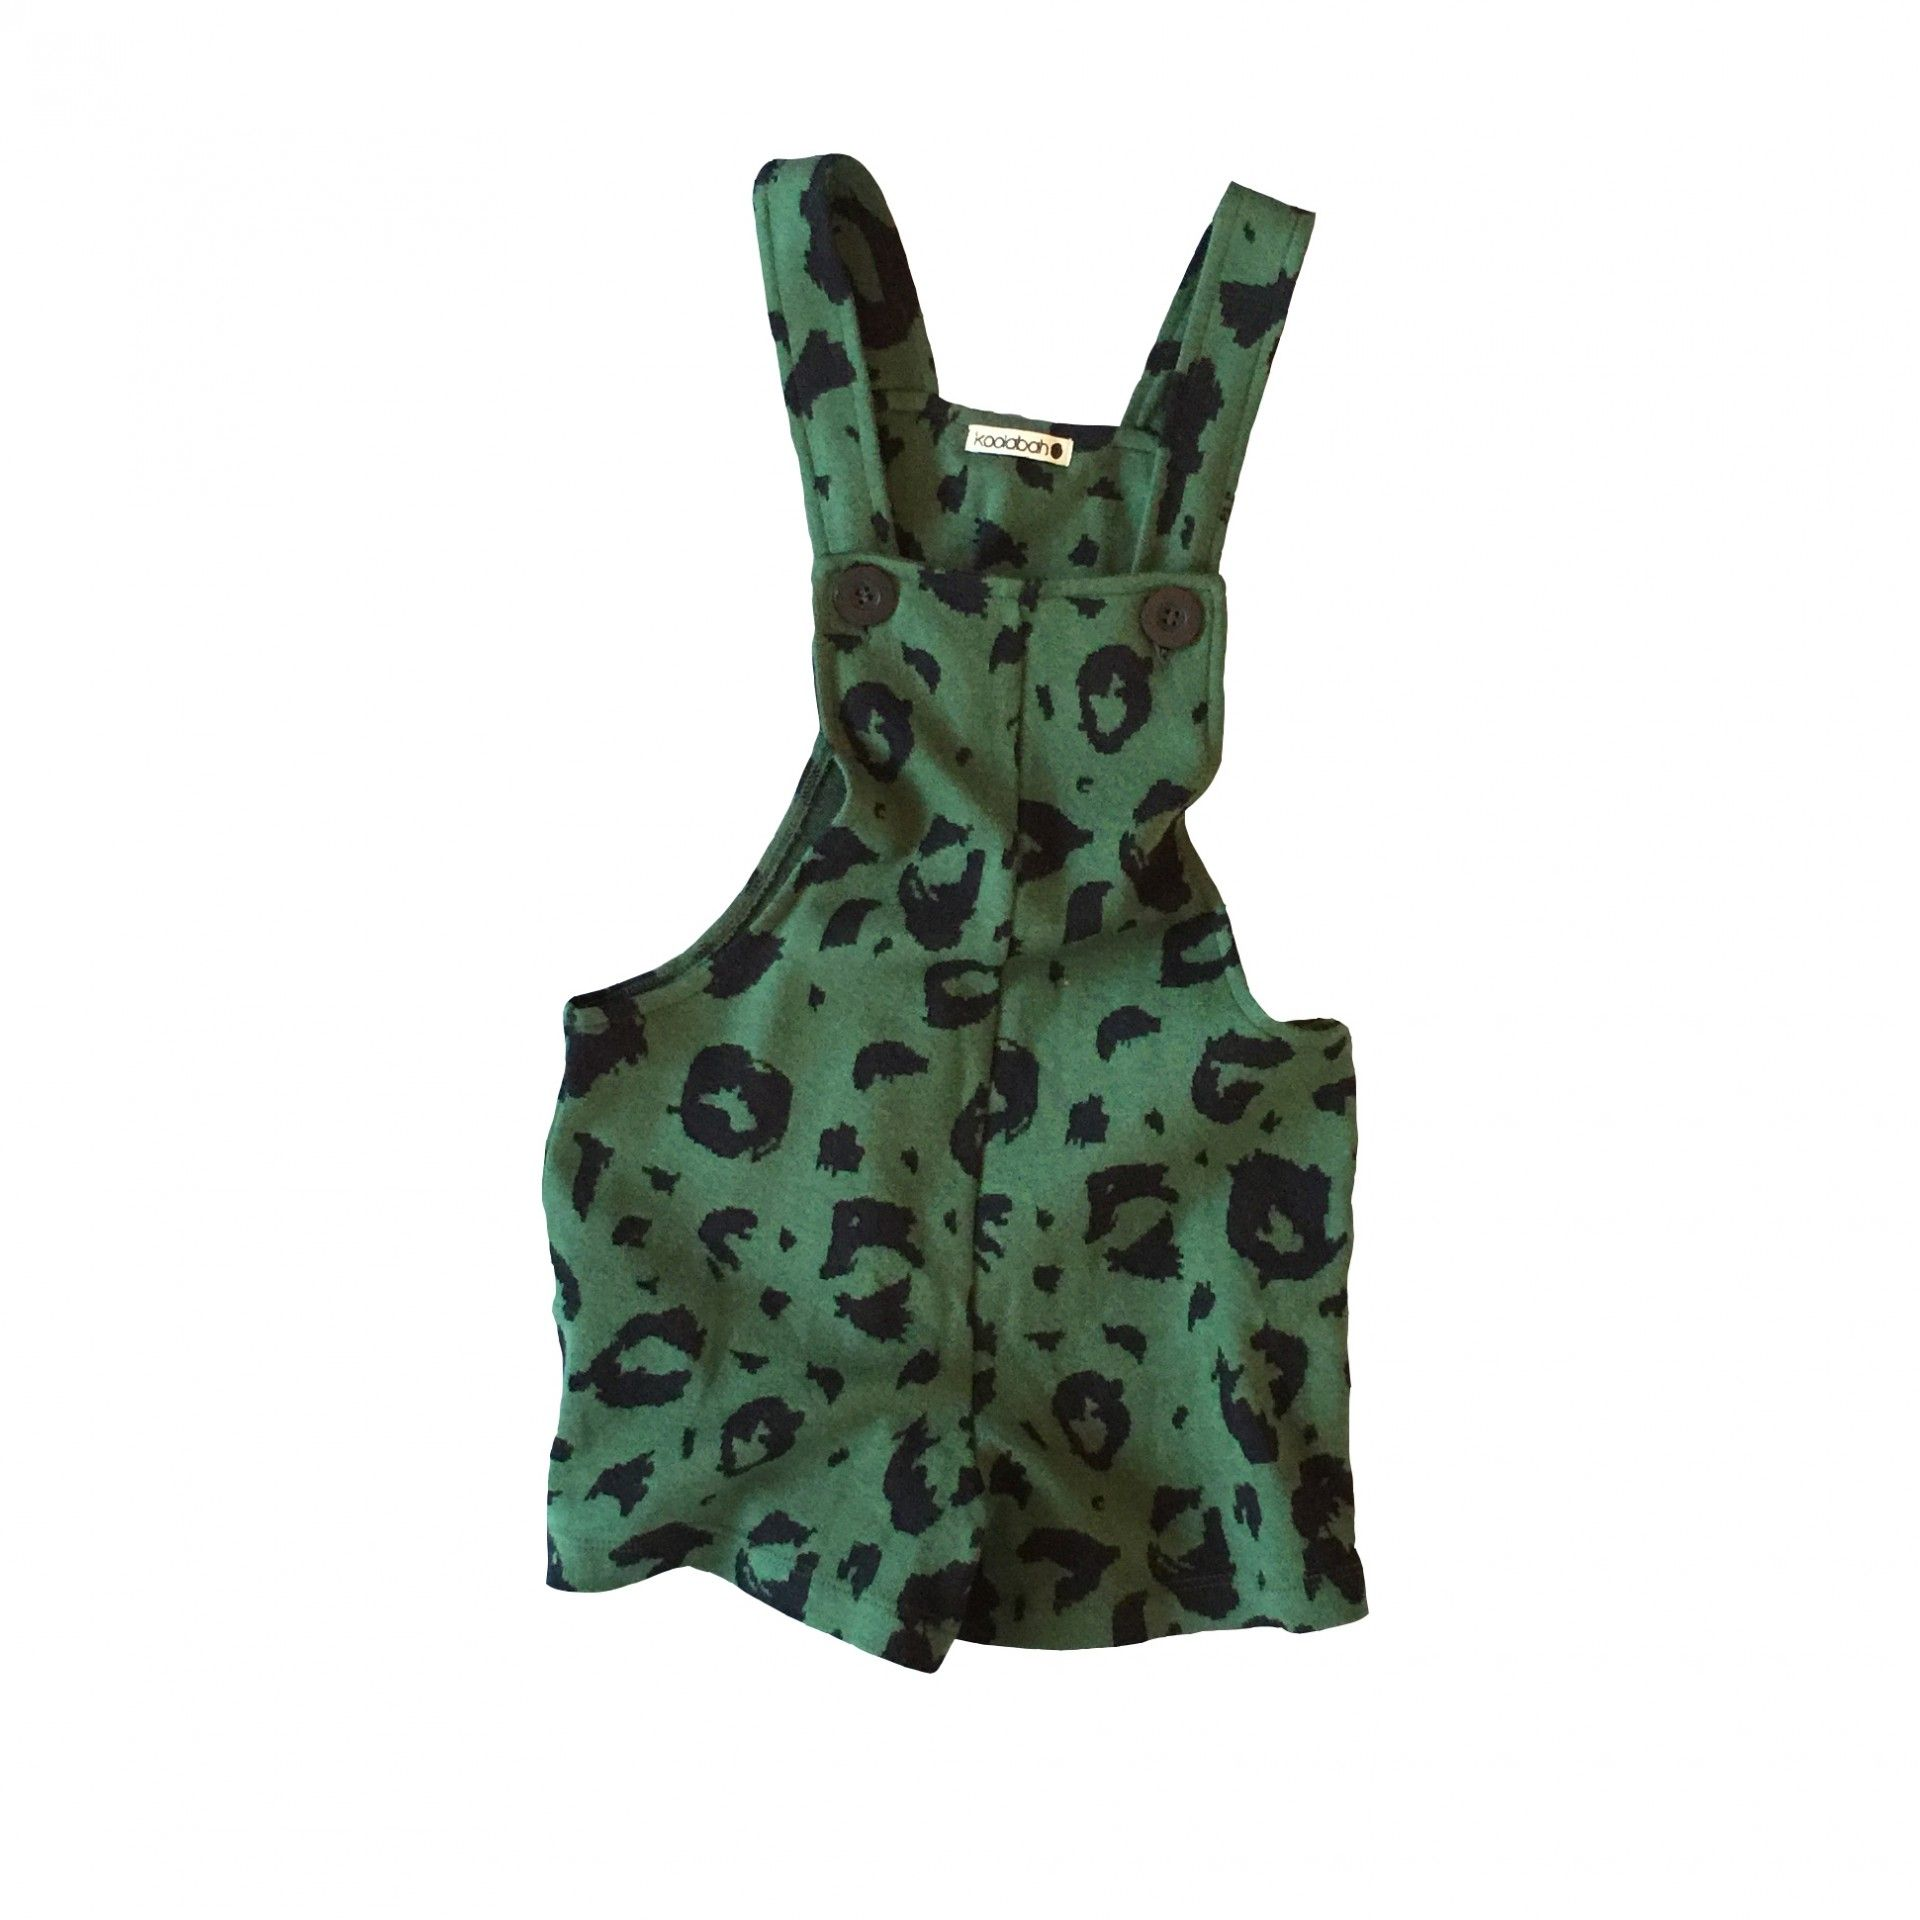 6dbc27b0277 Koolabah - LO DUNGAREE   Boys&Girls - Παιδικά ρούχα από οργανικό ...